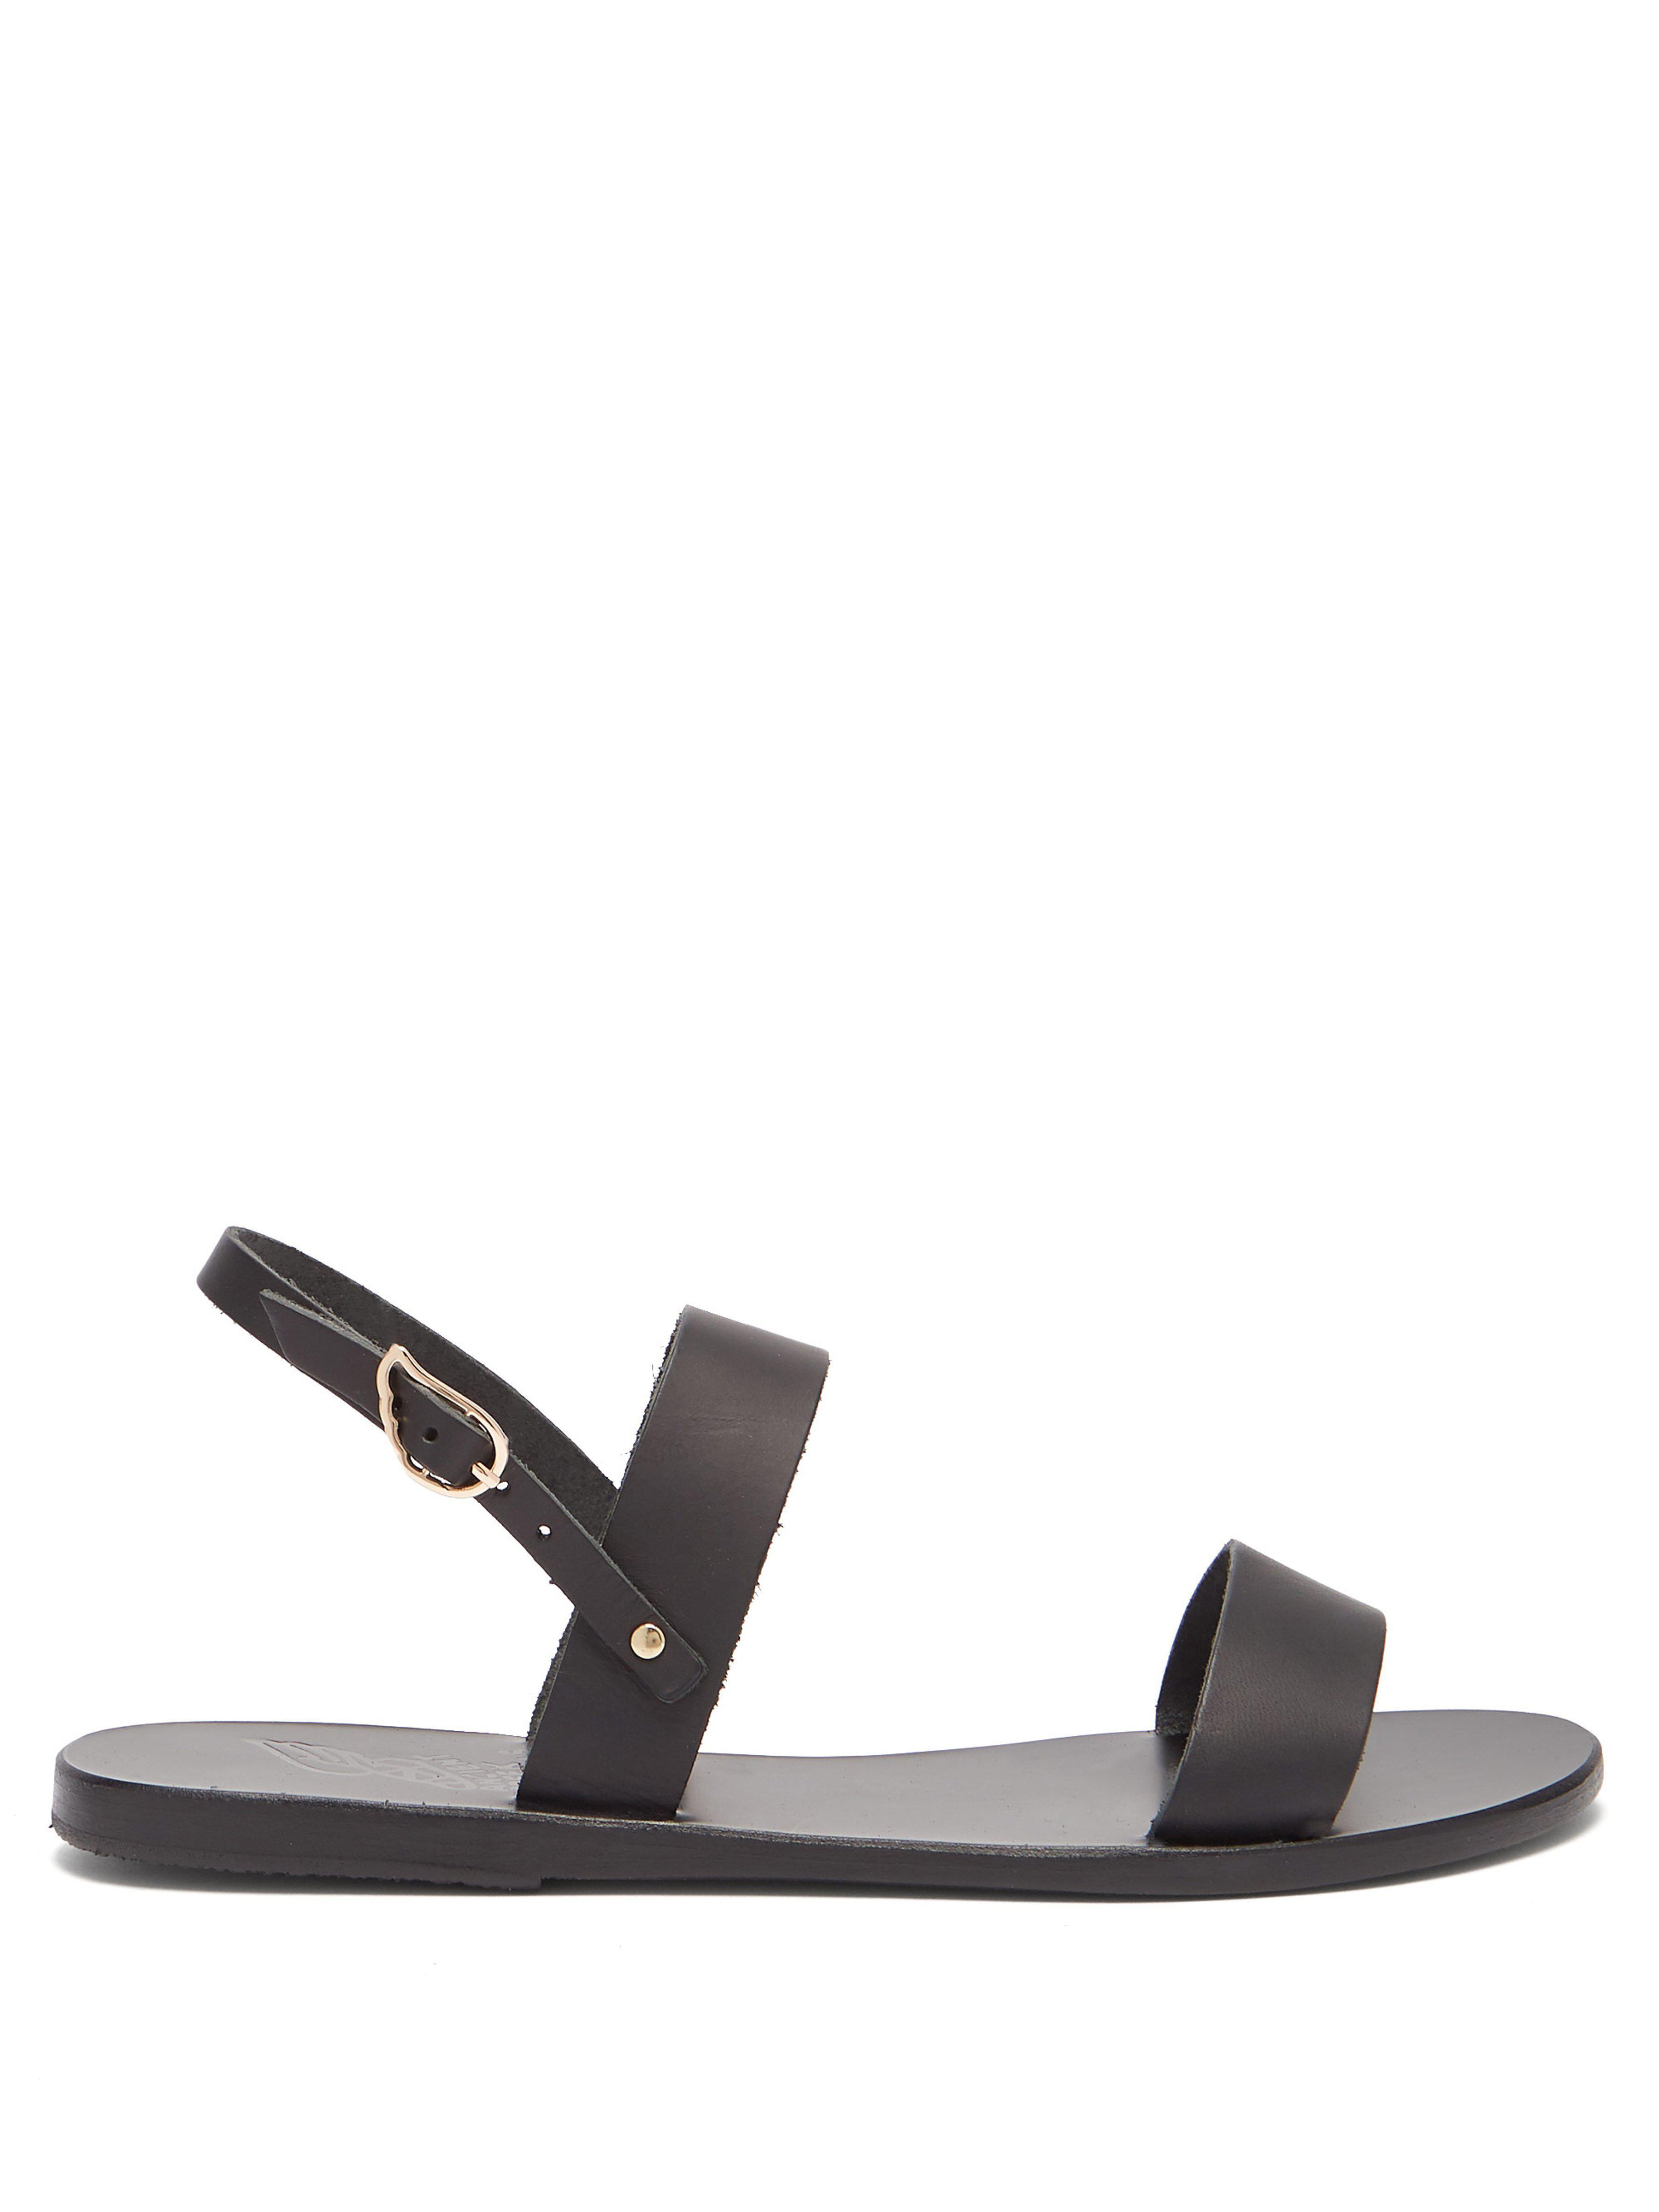 445b07c803b51 Ancient Greek Sandals Clio Leather Sandals in Black - Lyst